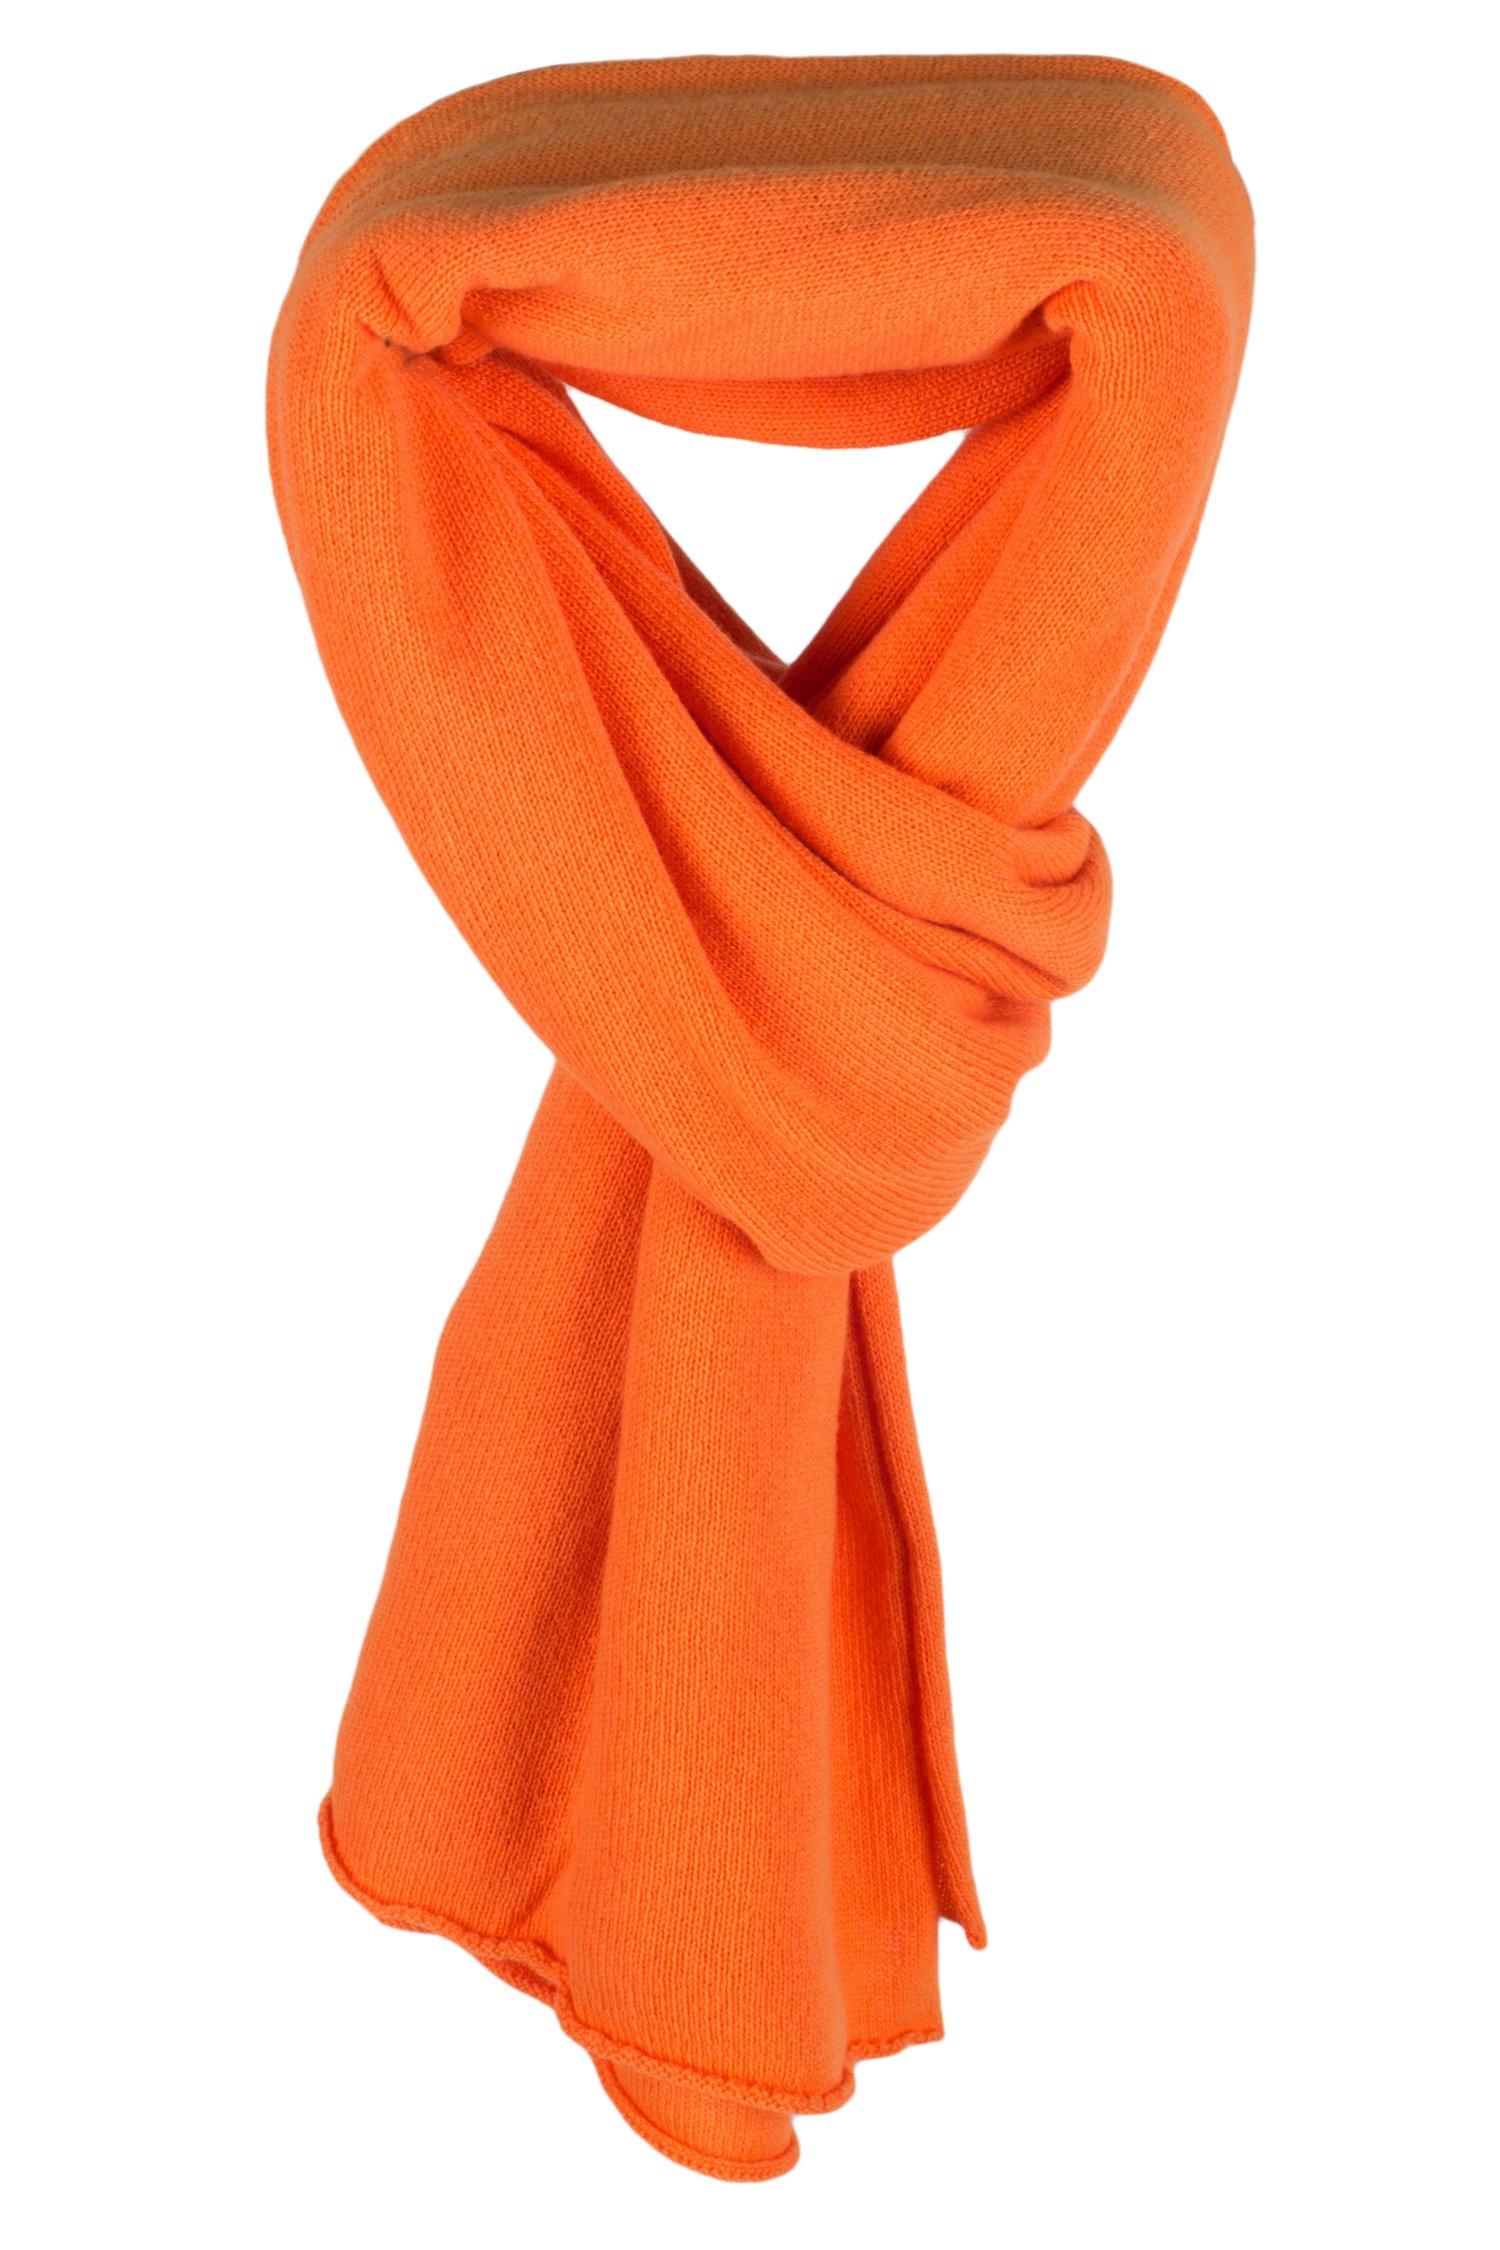 Ladies 100% Cashmere Wrap Scarf - Orange - hand made in Scotland by Love Cashmere